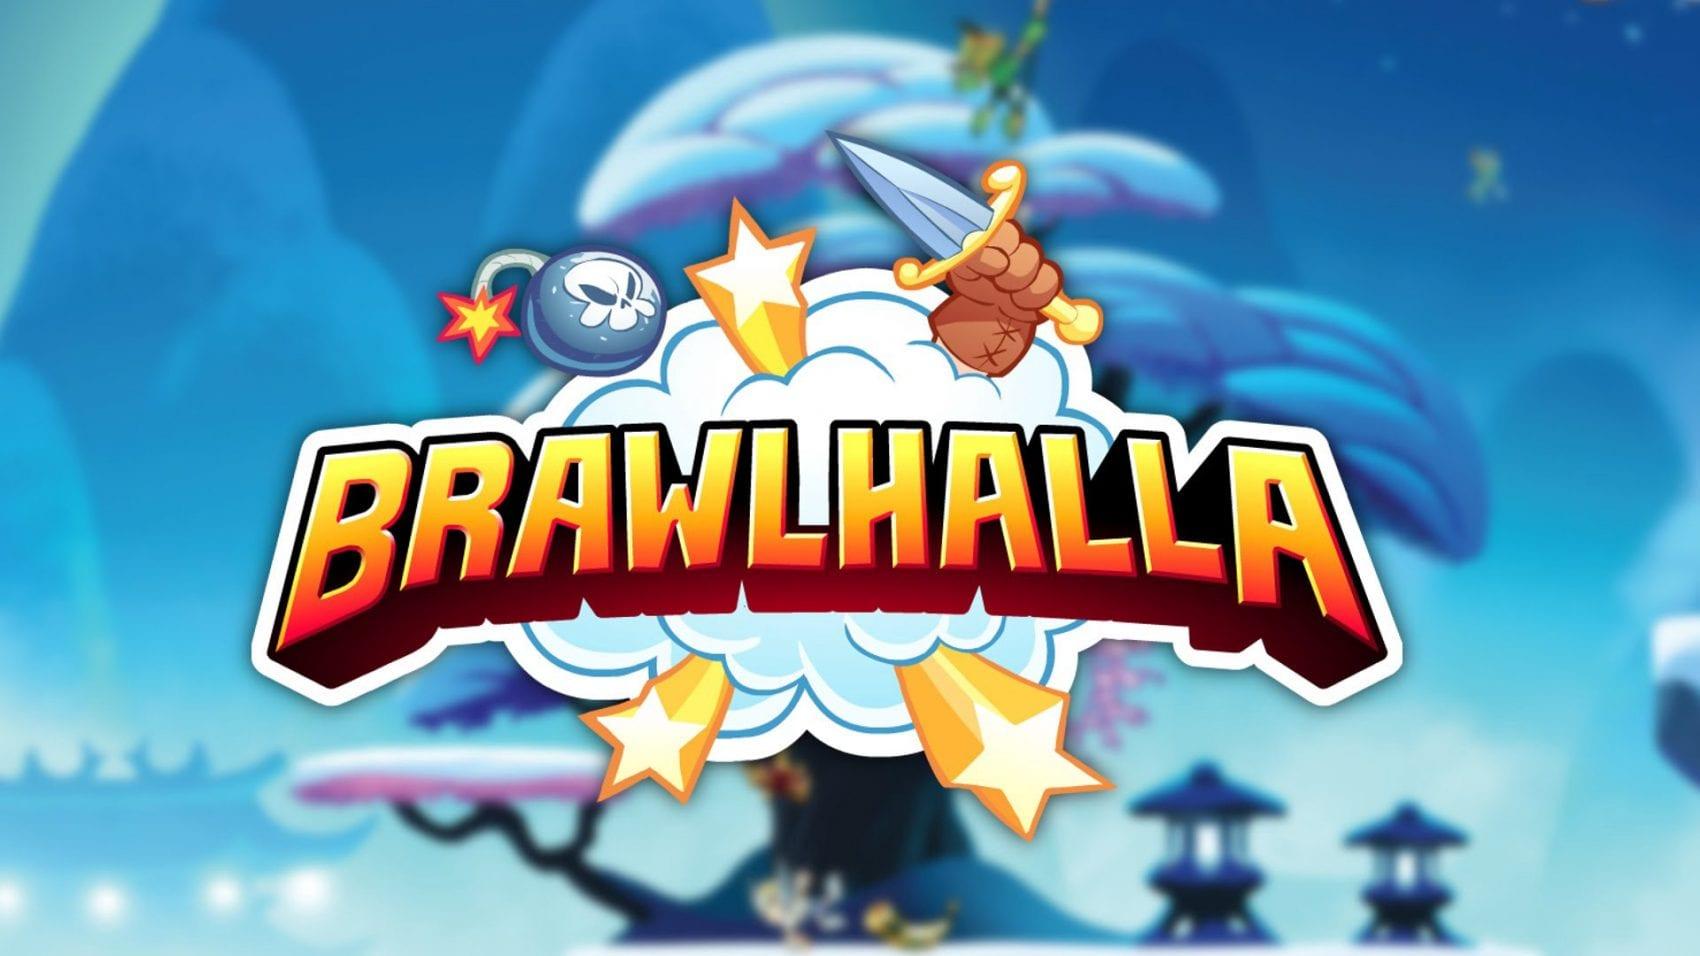 NEWS – Brawlhalla